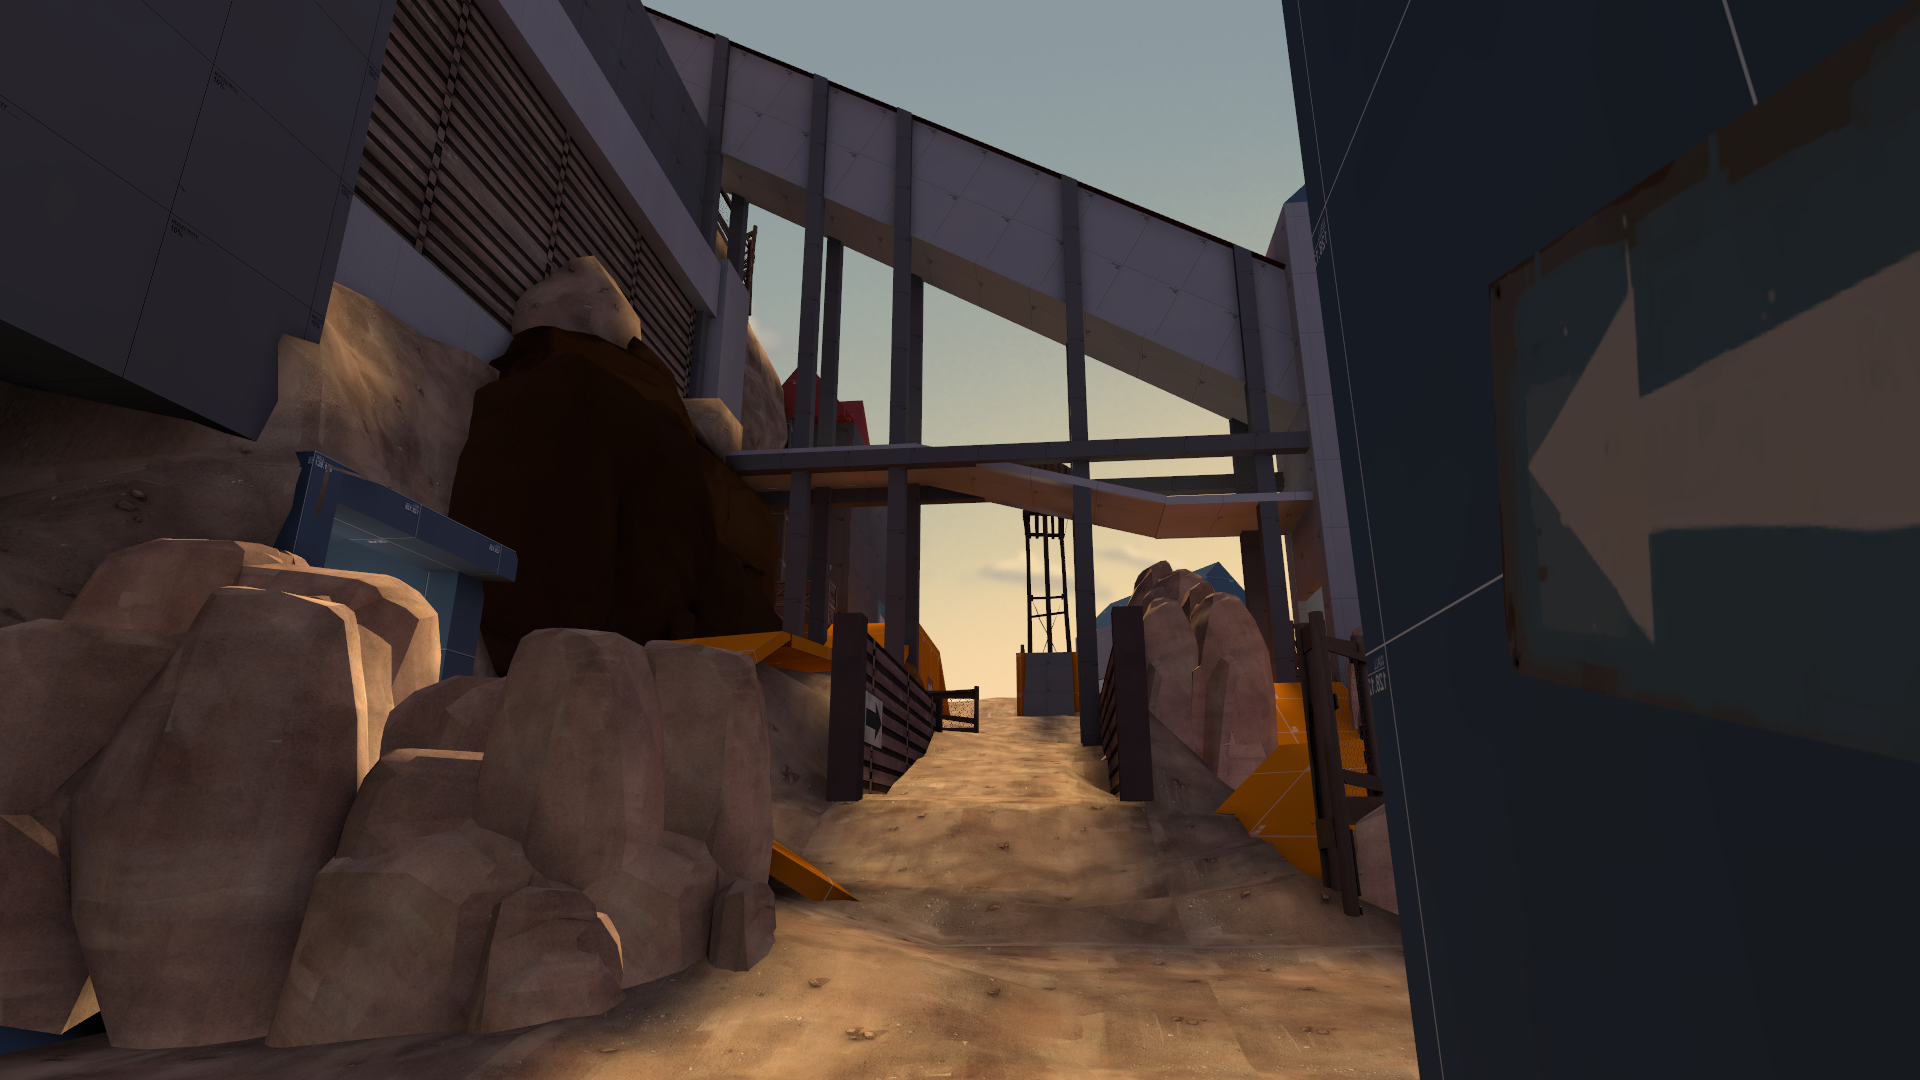 Team Fortress 2 Screenshot 2020.01.17 - 21.38.37.21.png